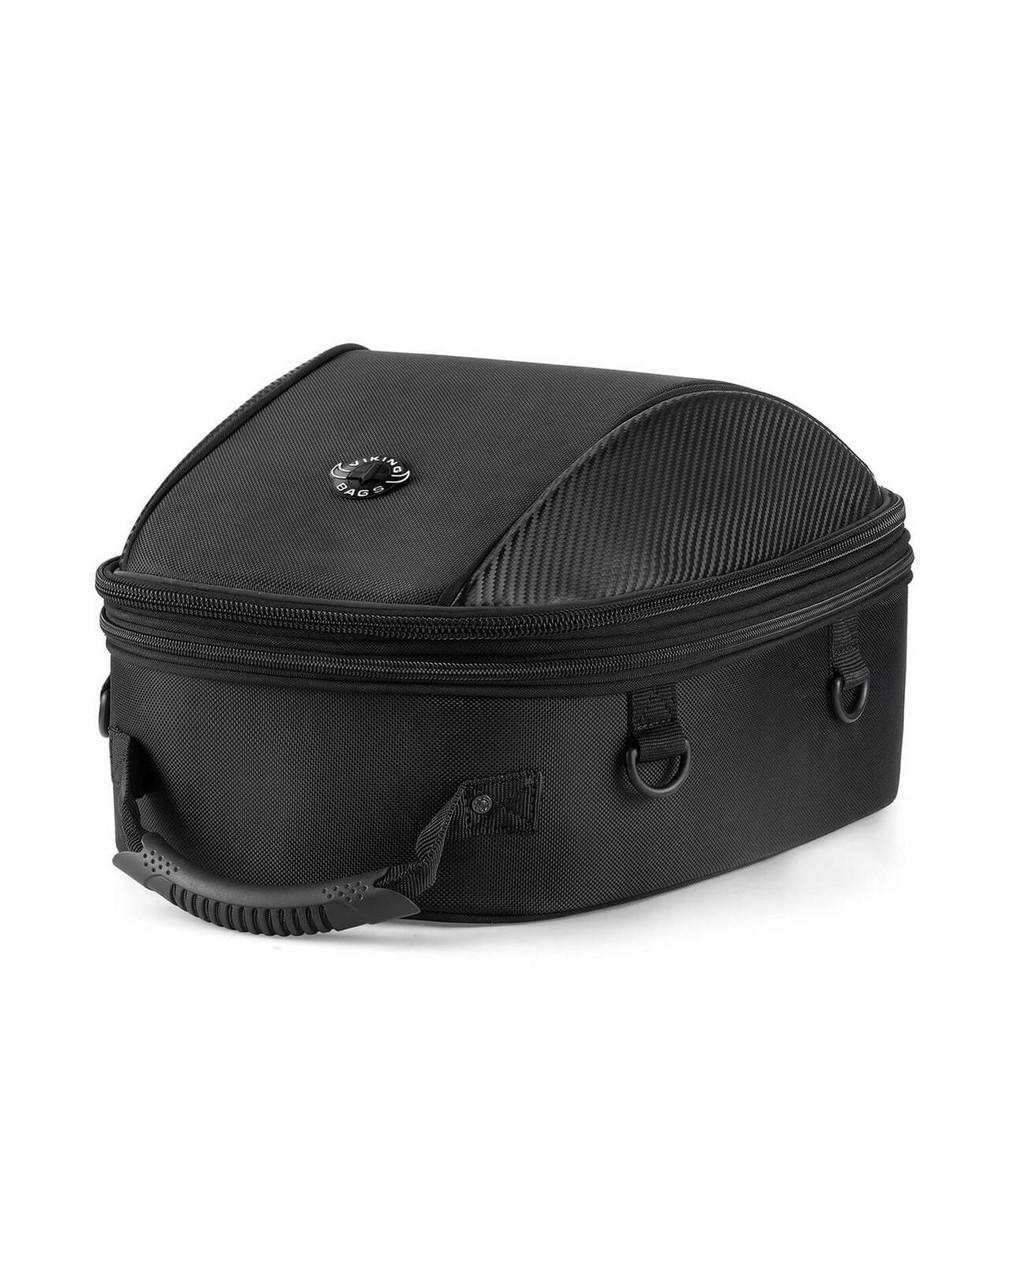 Viking Large Black Tail Bag For Harley Davidson Main bag View